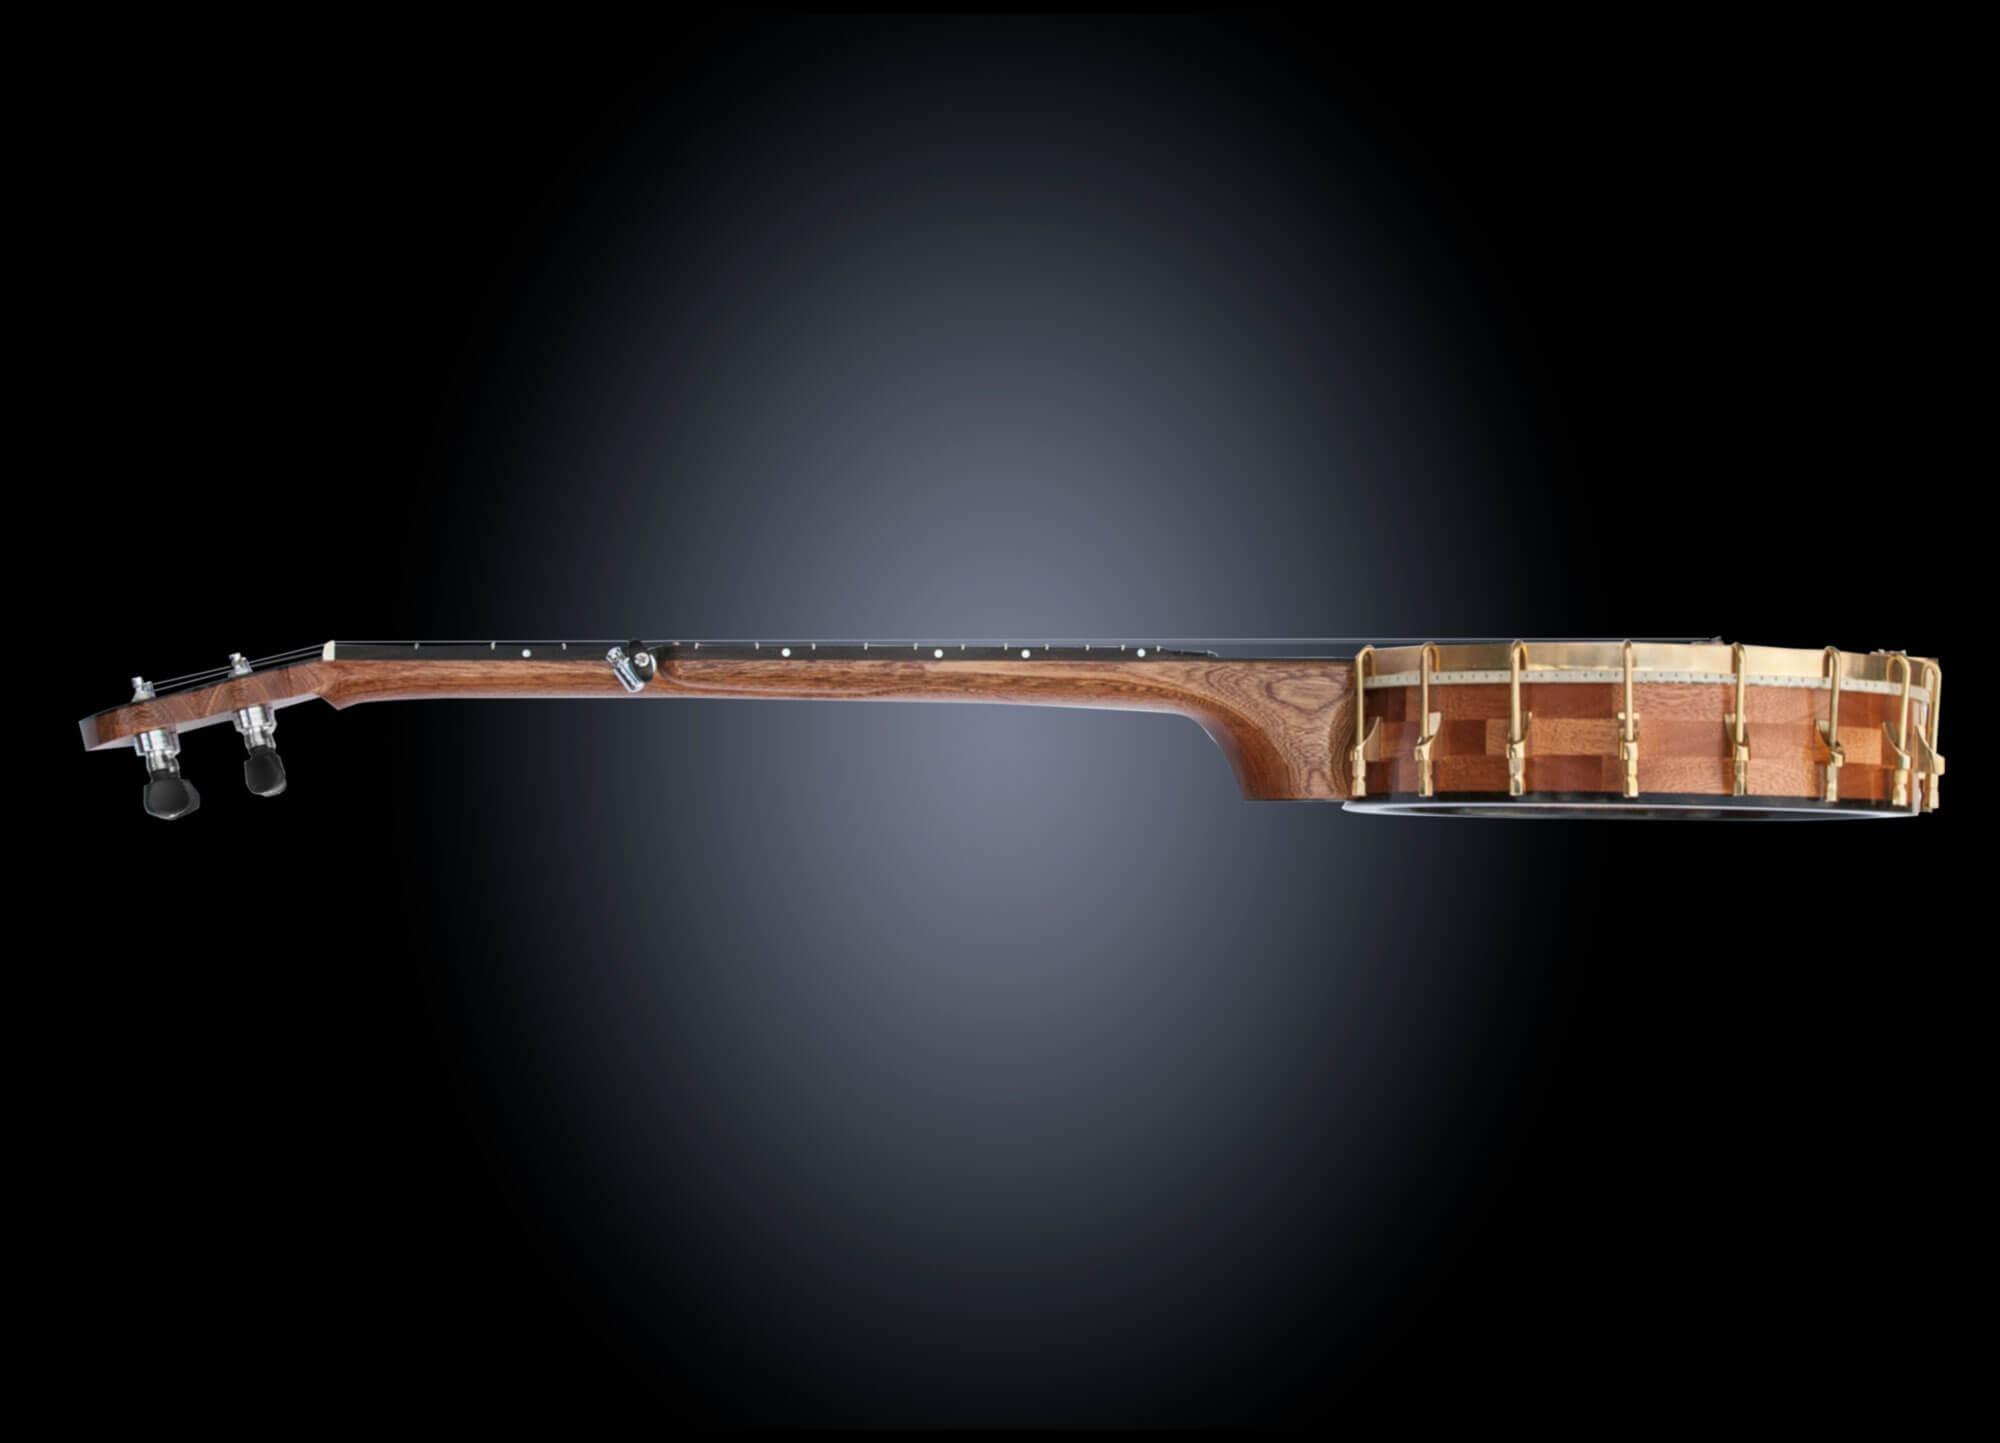 11-inch-rim-sapele-rosewood-banjo side